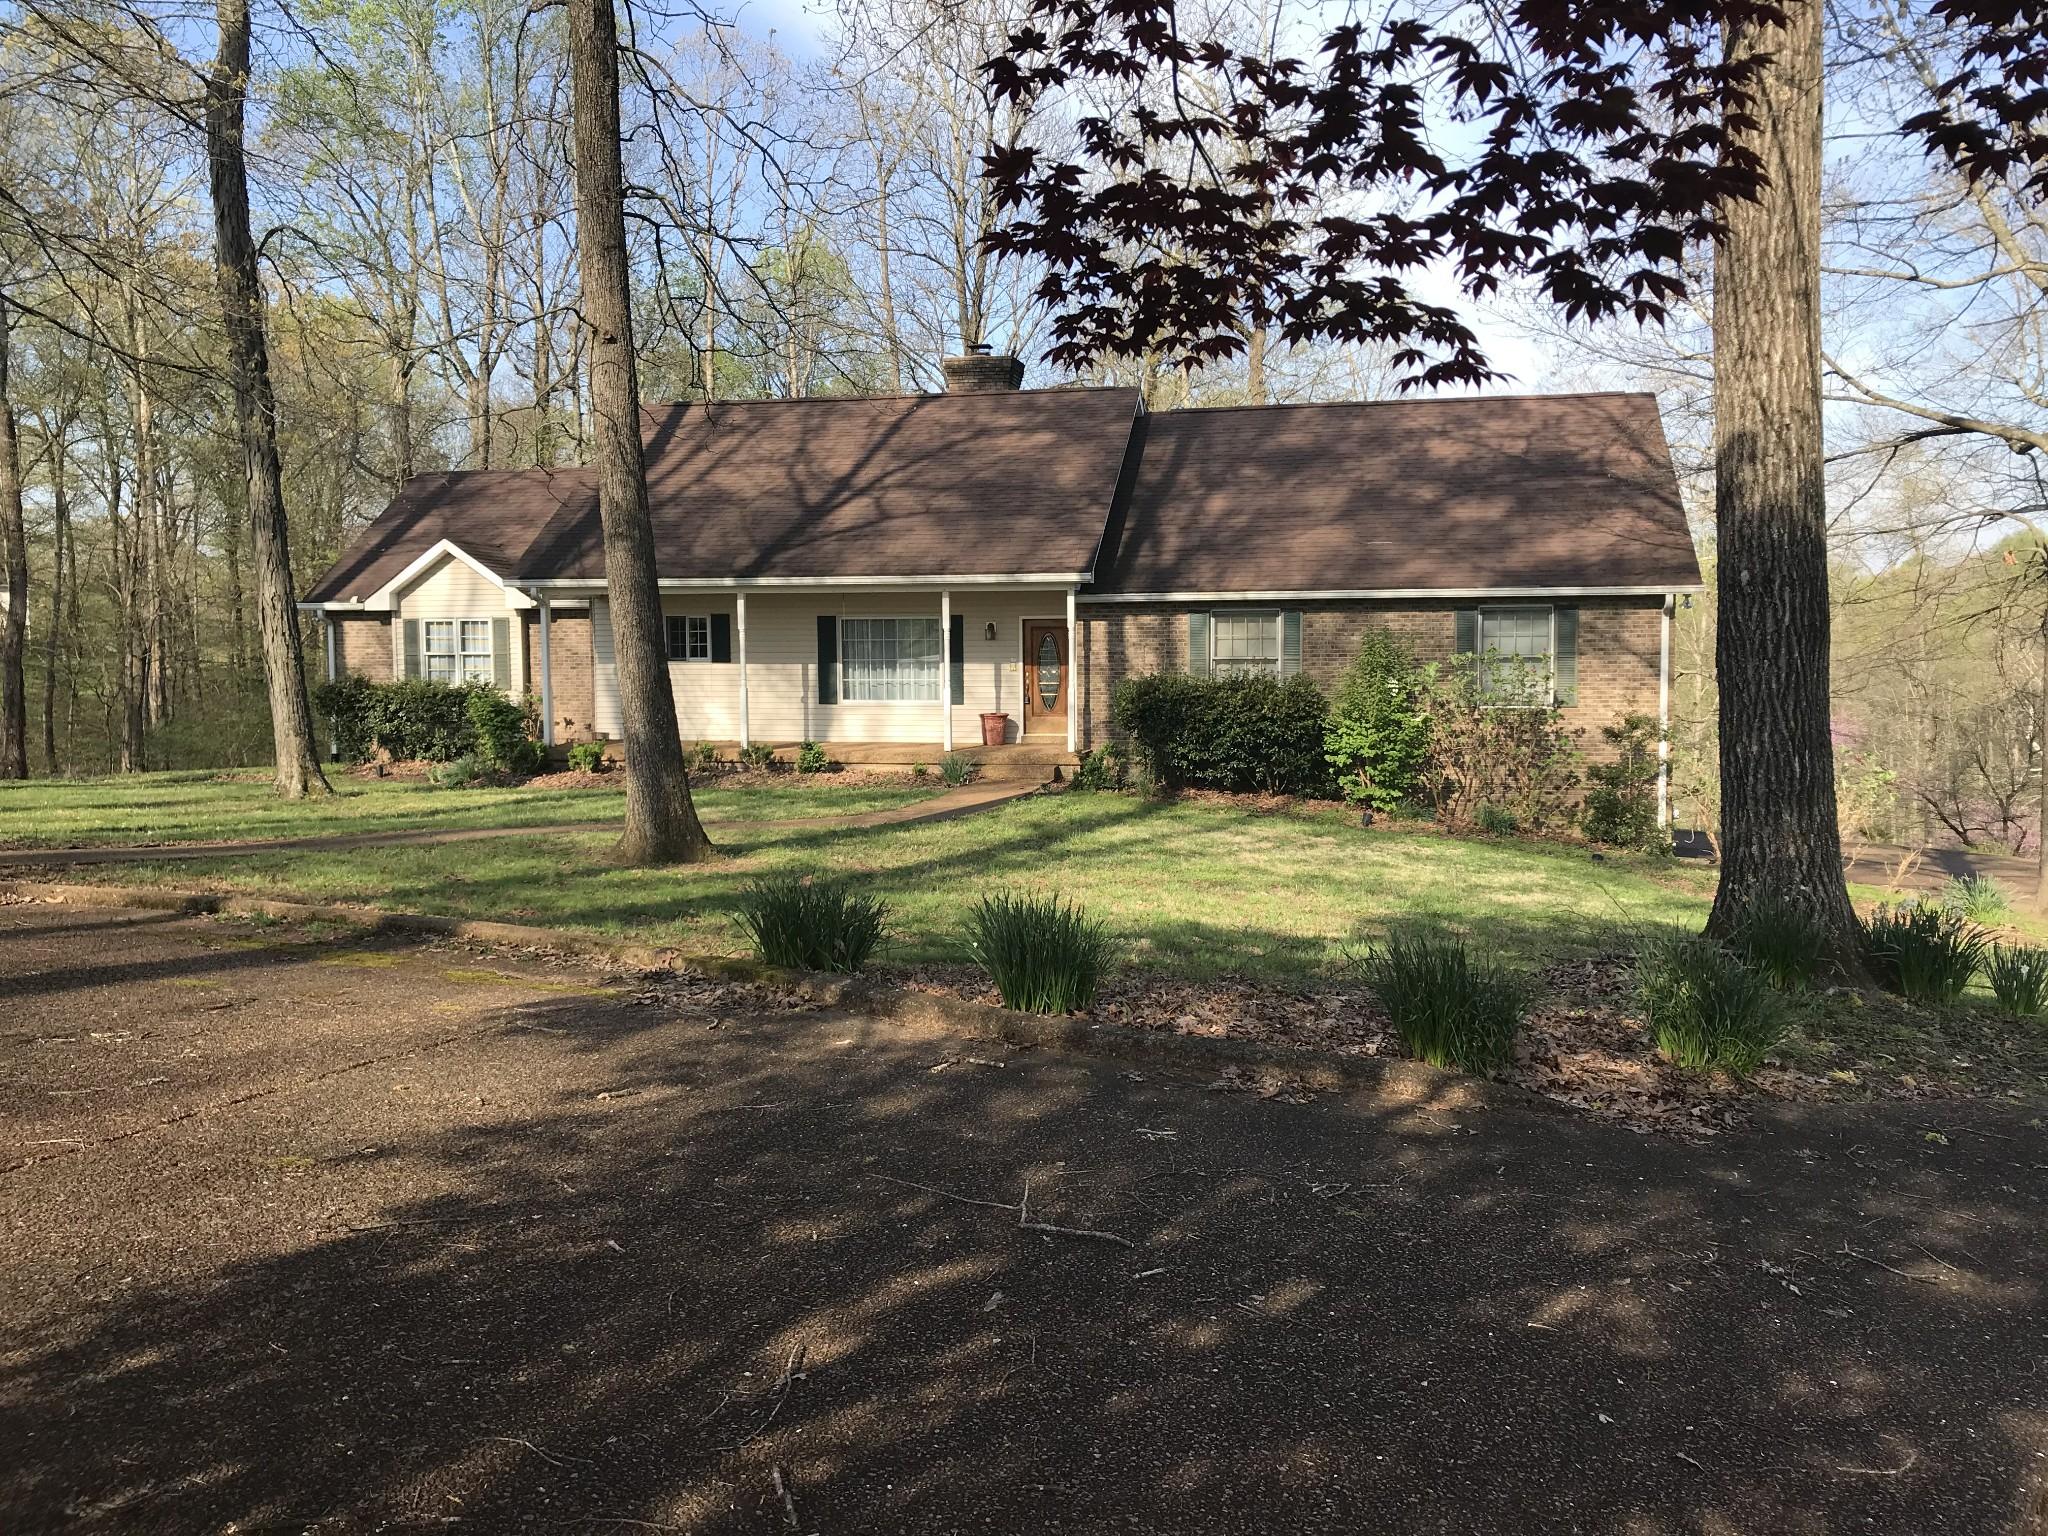 4040 Meadow VIew Circle, Pleasant View, TN 37146 - Pleasant View, TN real estate listing